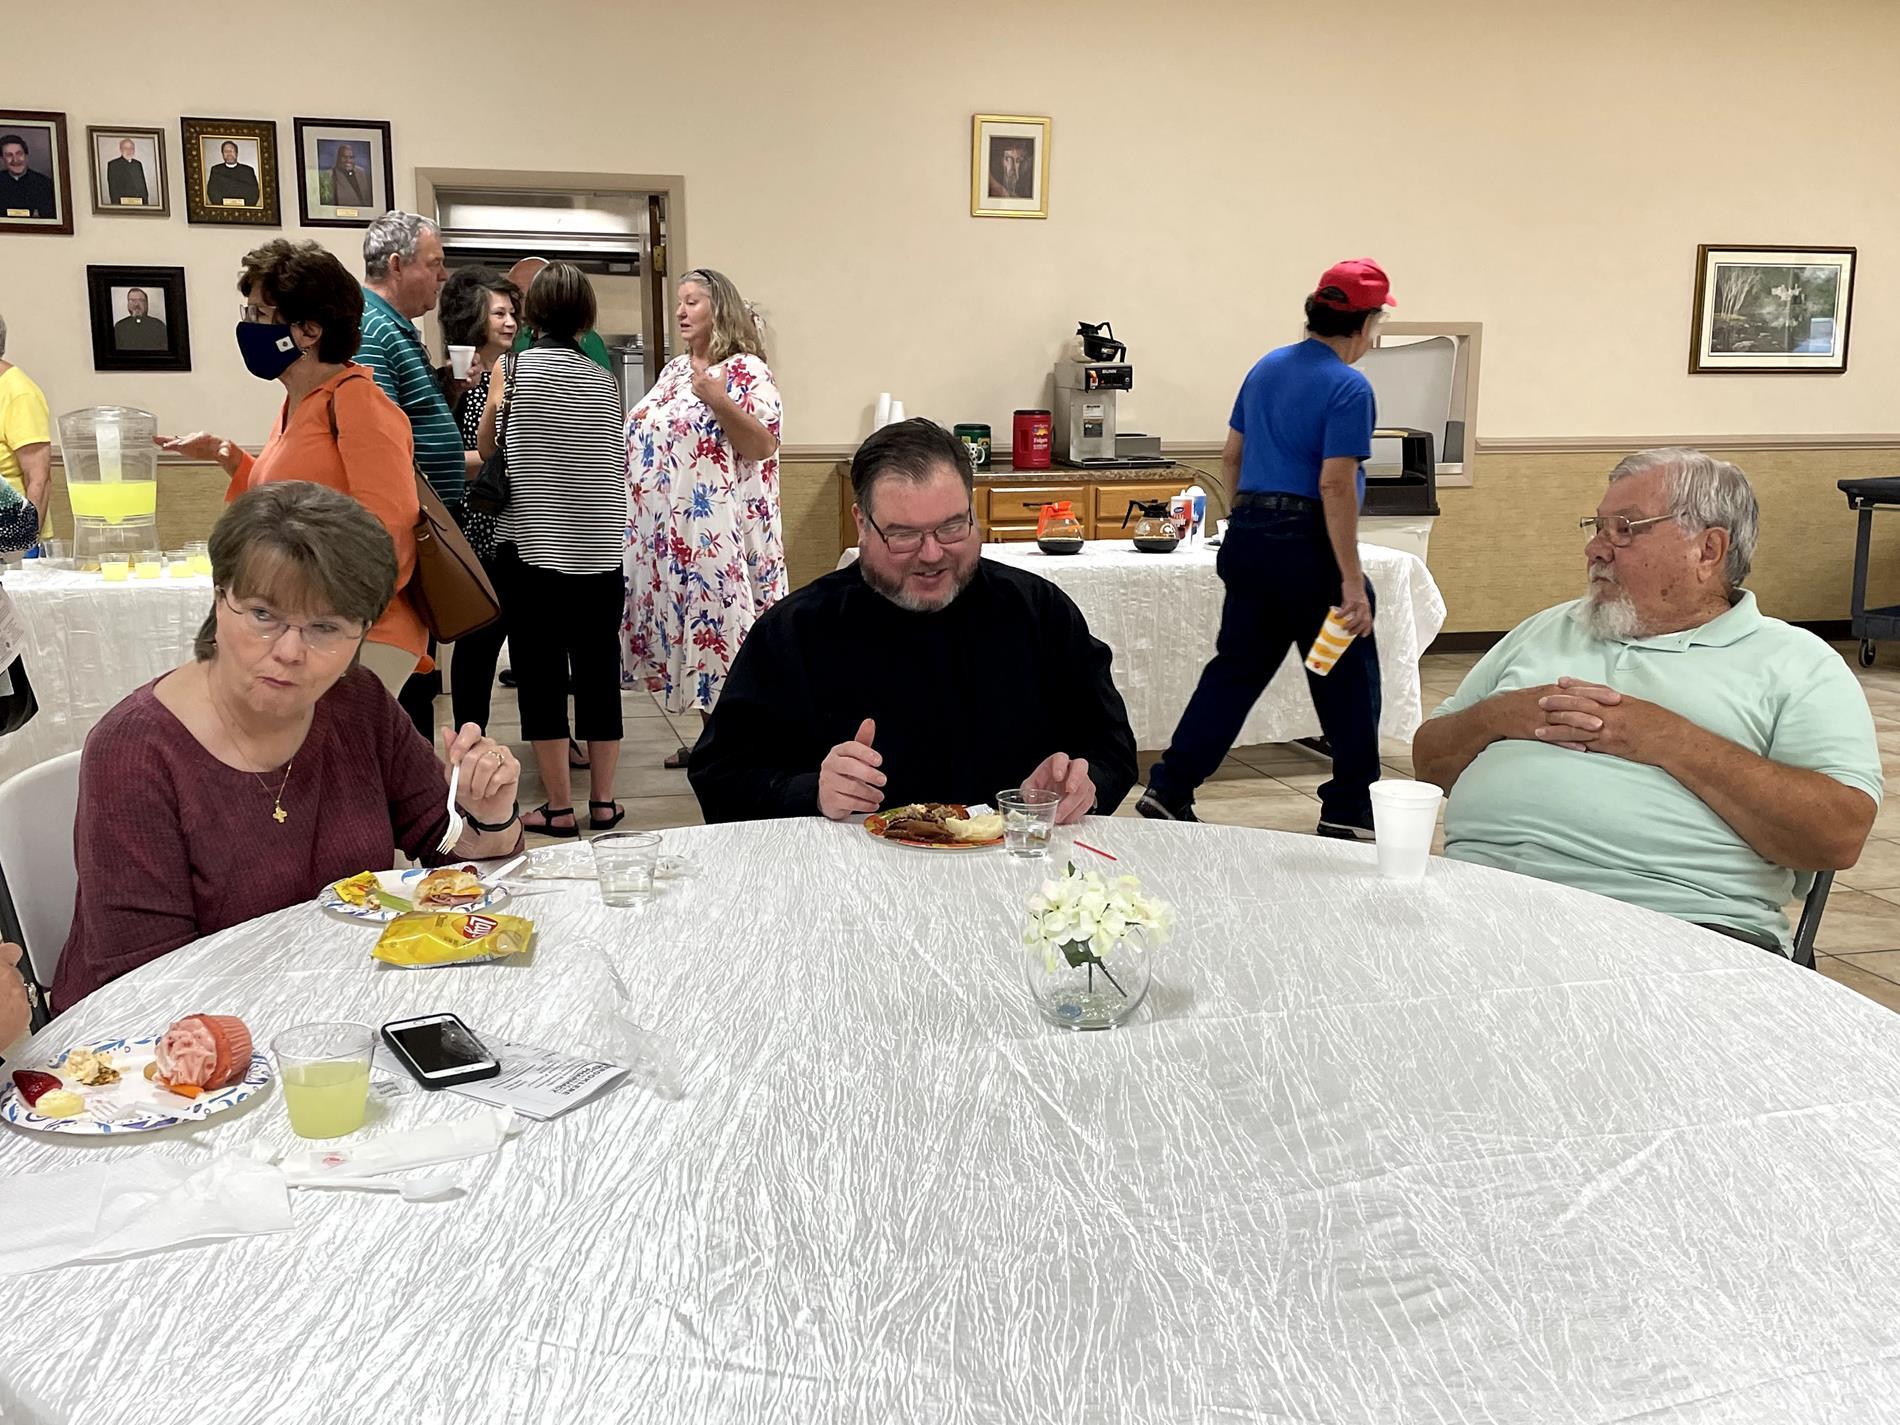 Visiting with parishioners